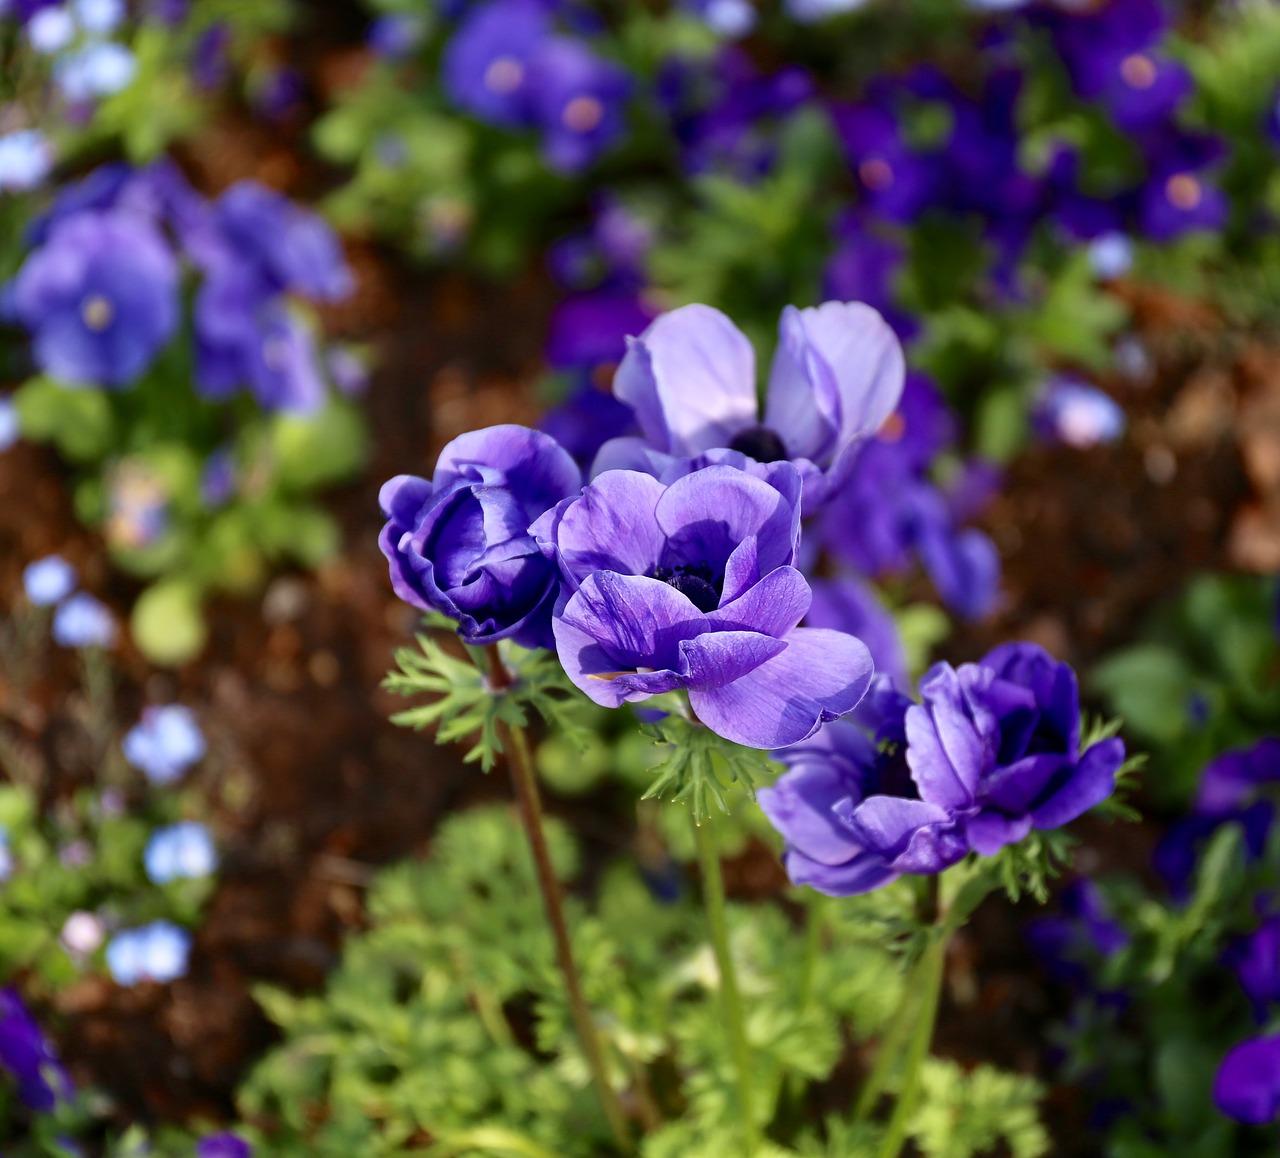 Flowersperennialsplantgardenplanting Free Photo From Needpix